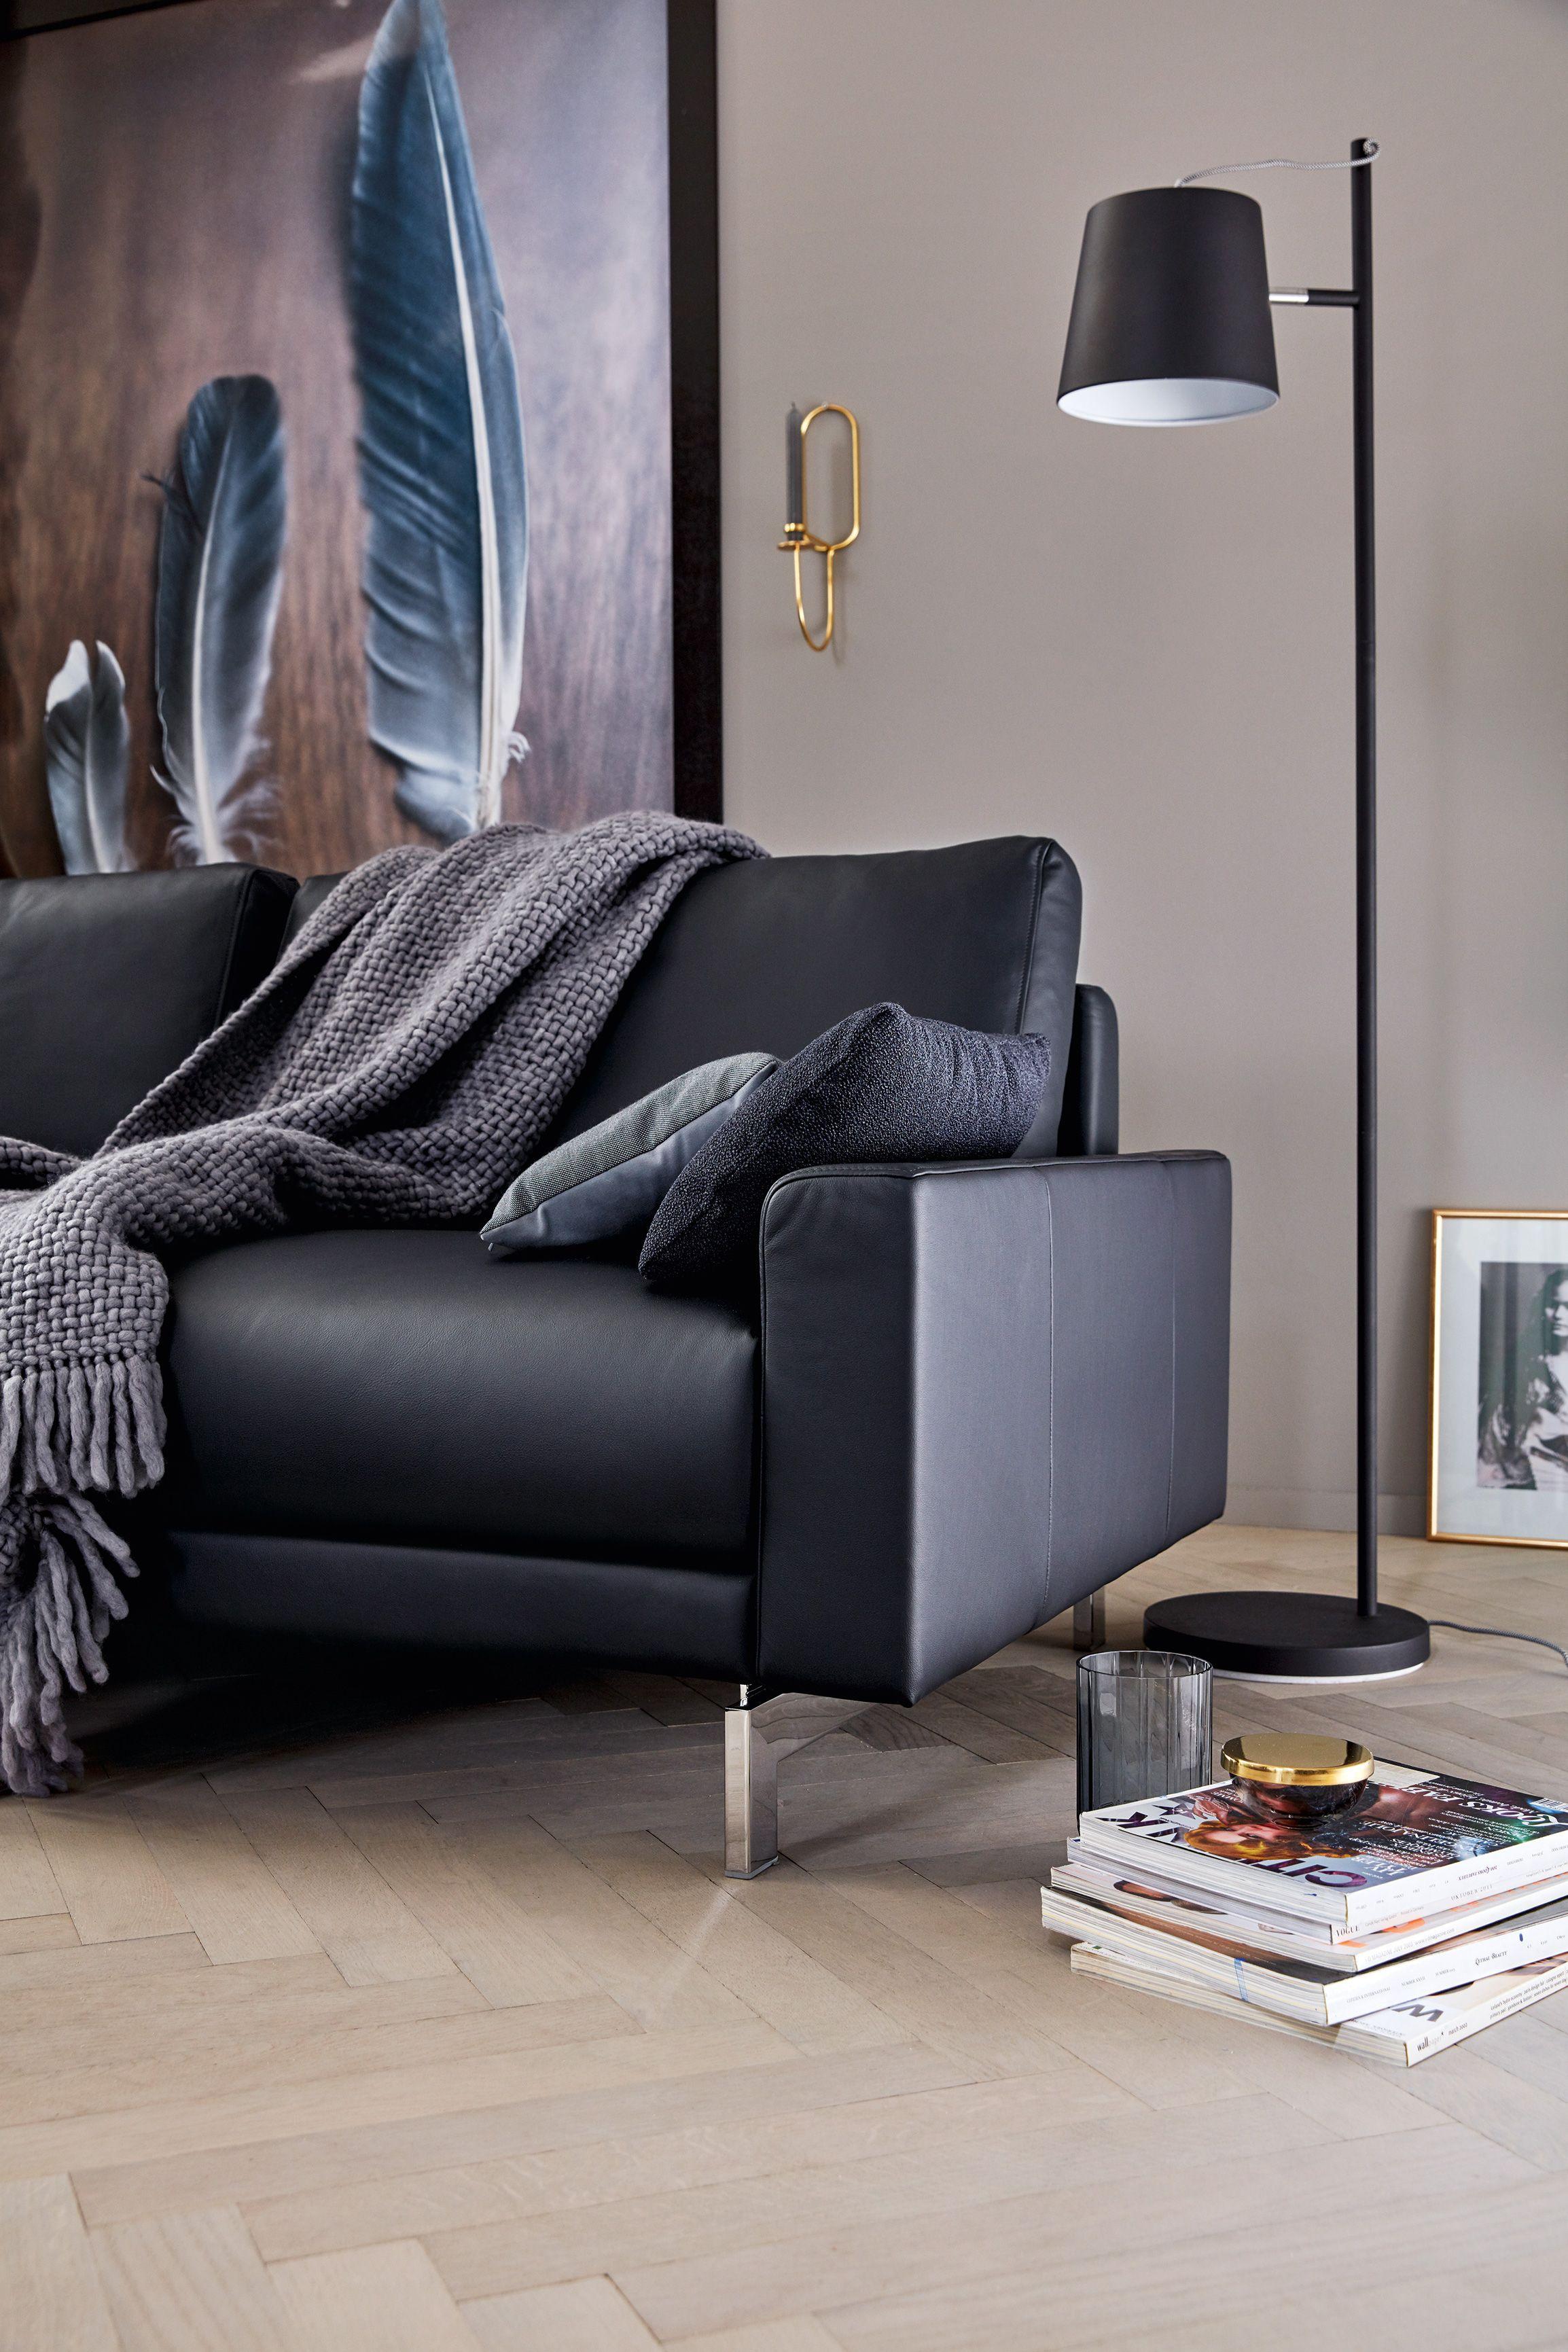 schmale sofas sofahusse sitzer luxus zweisitzer sofa ikea sitzer sofa ikea trendy size. Black Bedroom Furniture Sets. Home Design Ideas